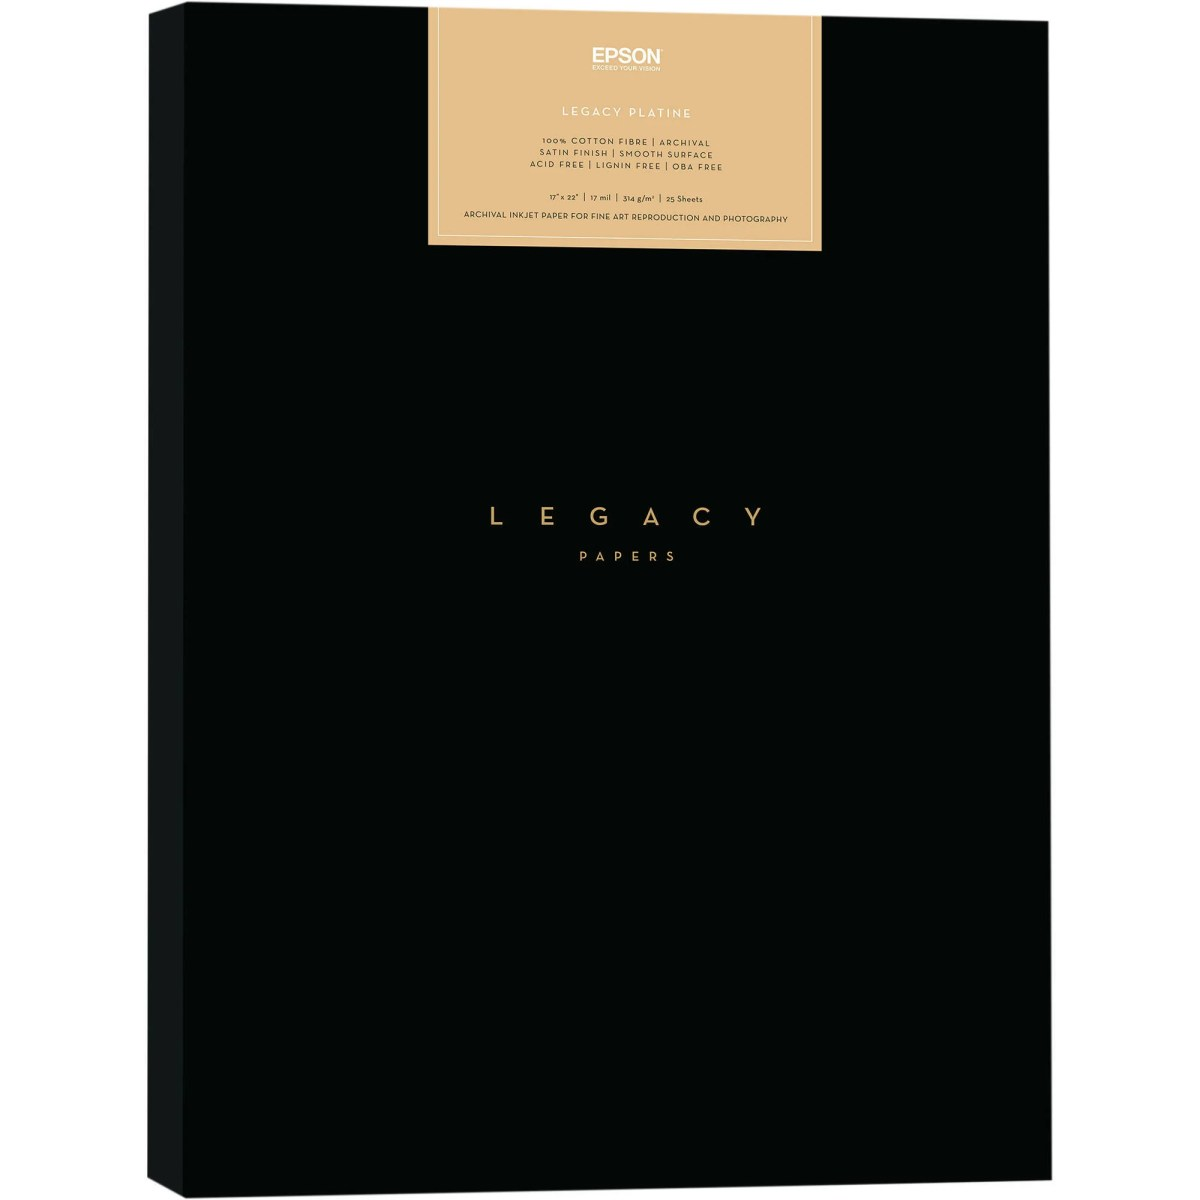 Premium Epson legacy printer paper